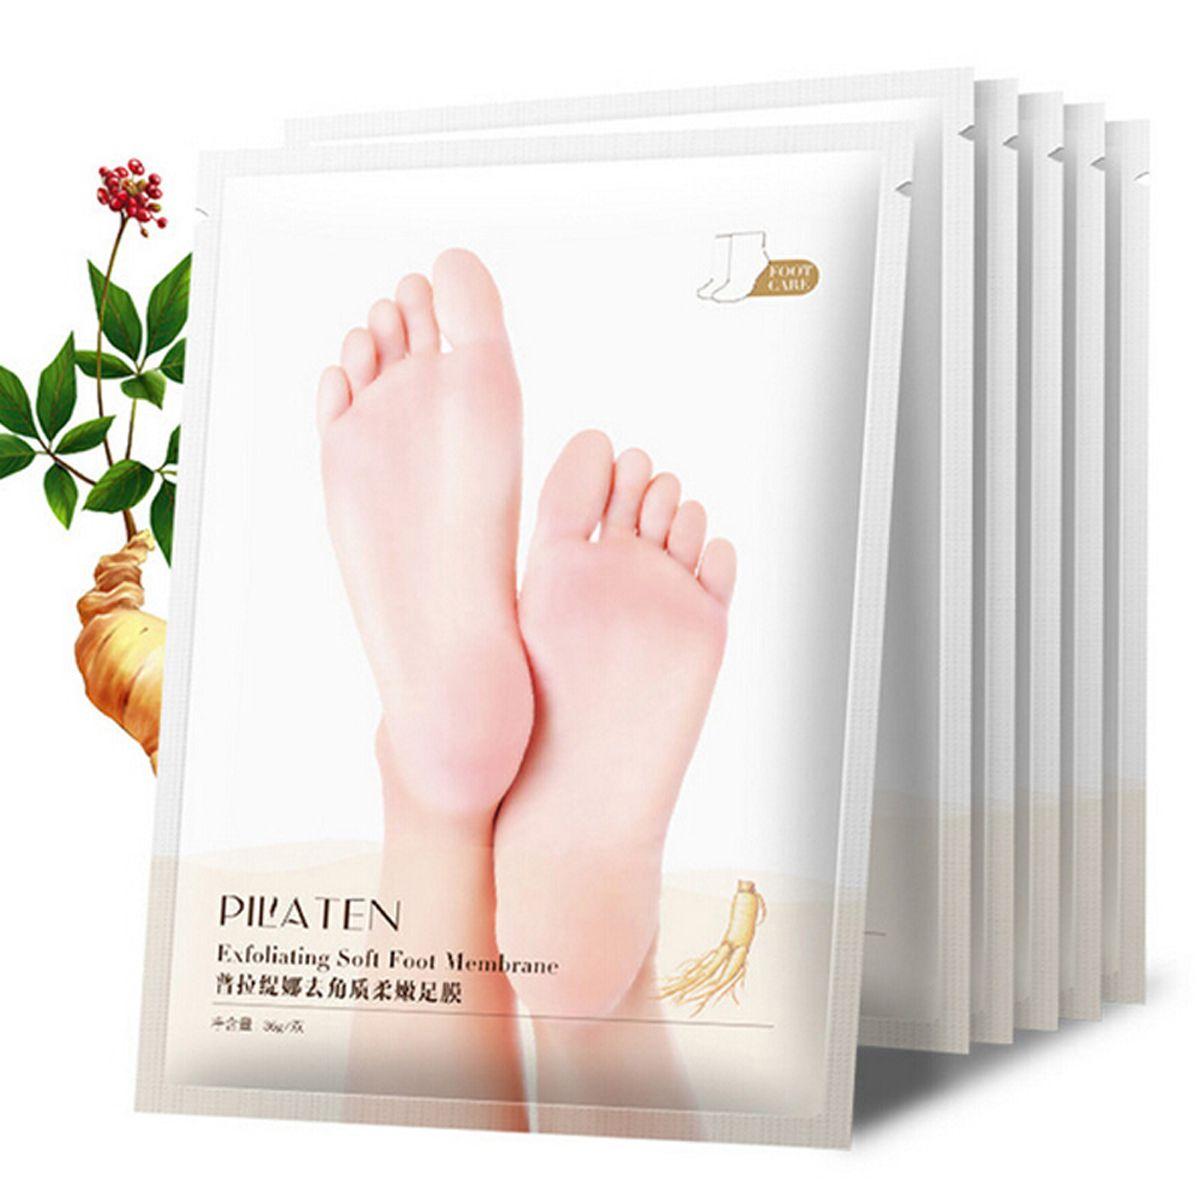 1Pair PILATEN Exfoliating Treatment Foot Mask Socks For Pedicure Baby Peel Feet Masks Skin Care Cosmetics Peeling